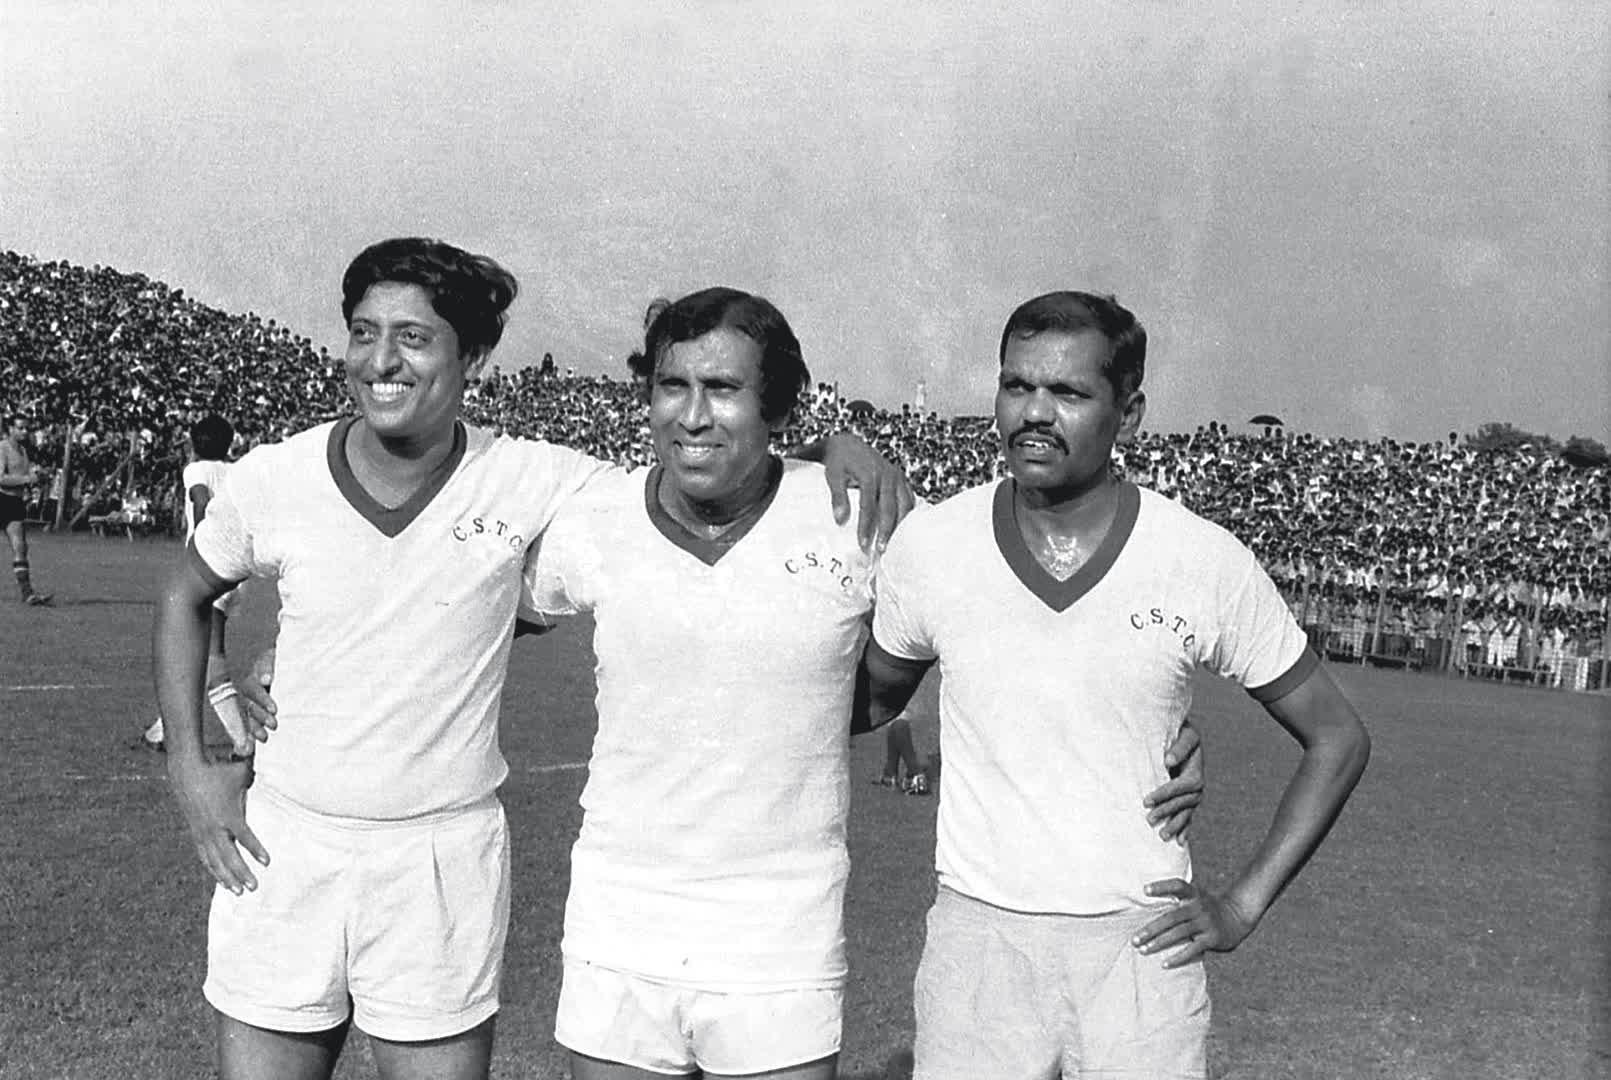 Famous troika of Indian football: (L to R) Chuni Goswami, PK Banerjee and Tulsidas Balaram